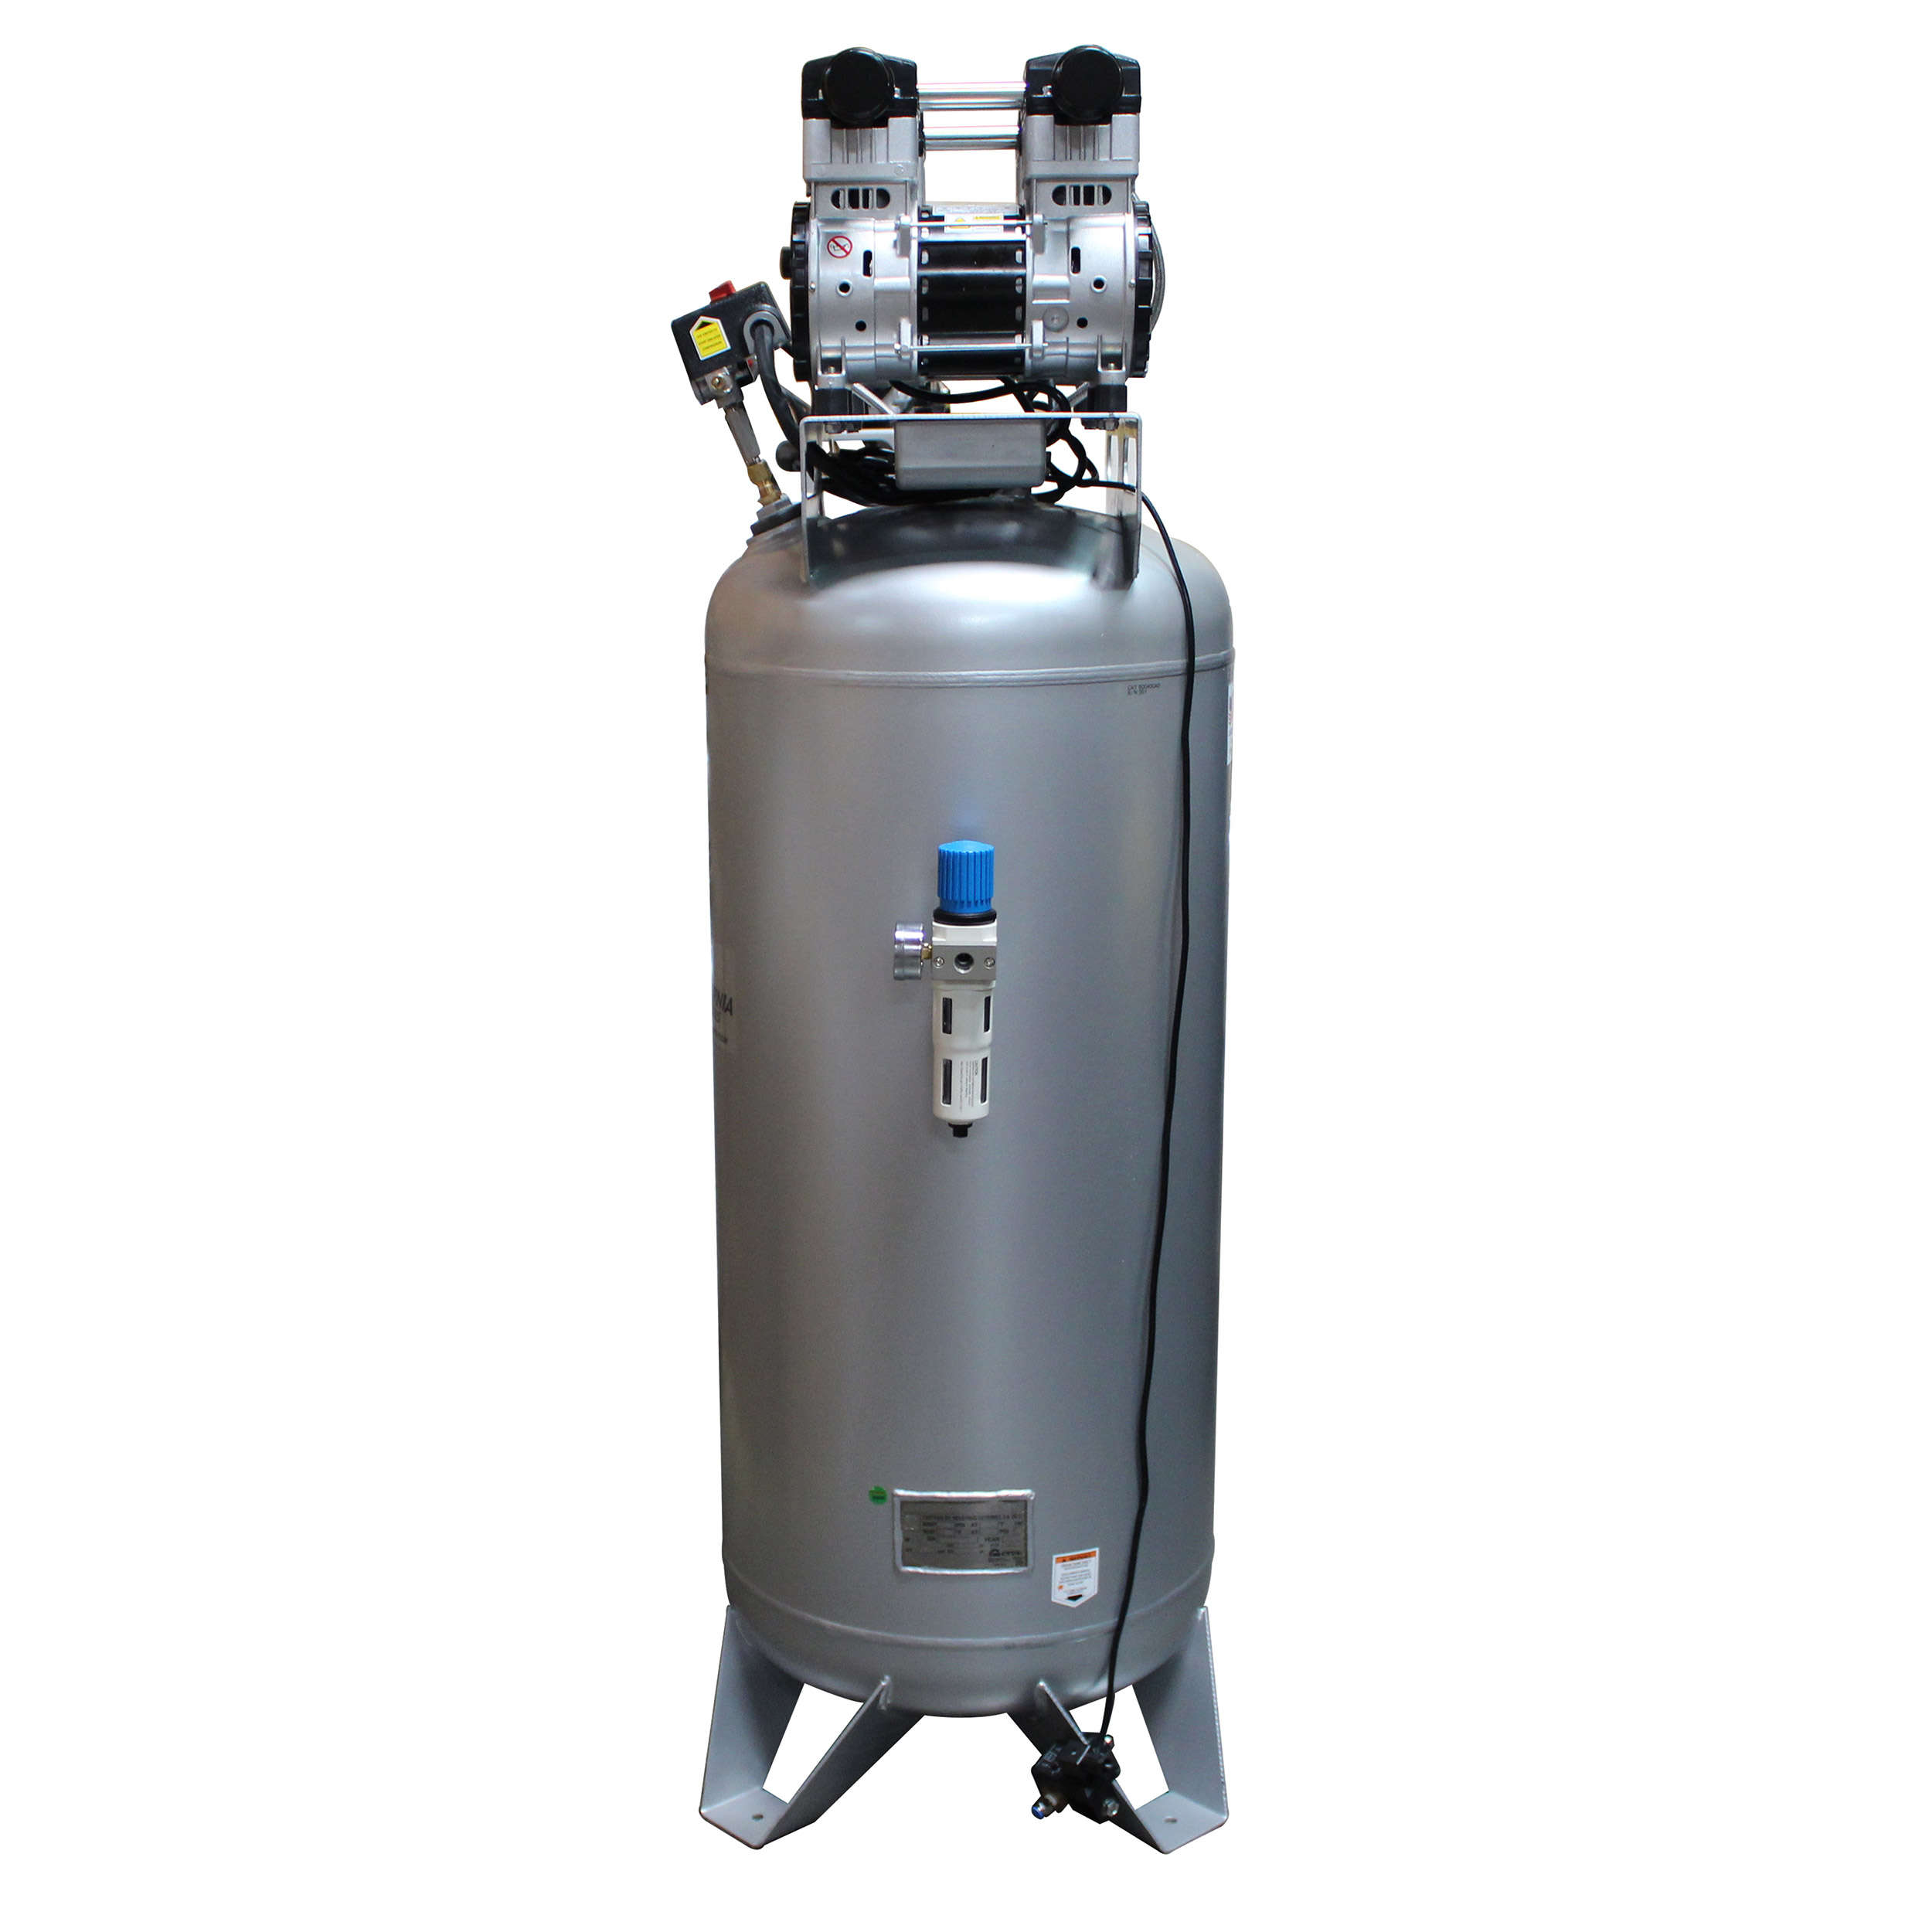 Steel Tank Air Compressor Automatic Drain Valve, 60040CAD, Ultra Quiet  & Oil-Free, 4.0 Hp, 60 gallon